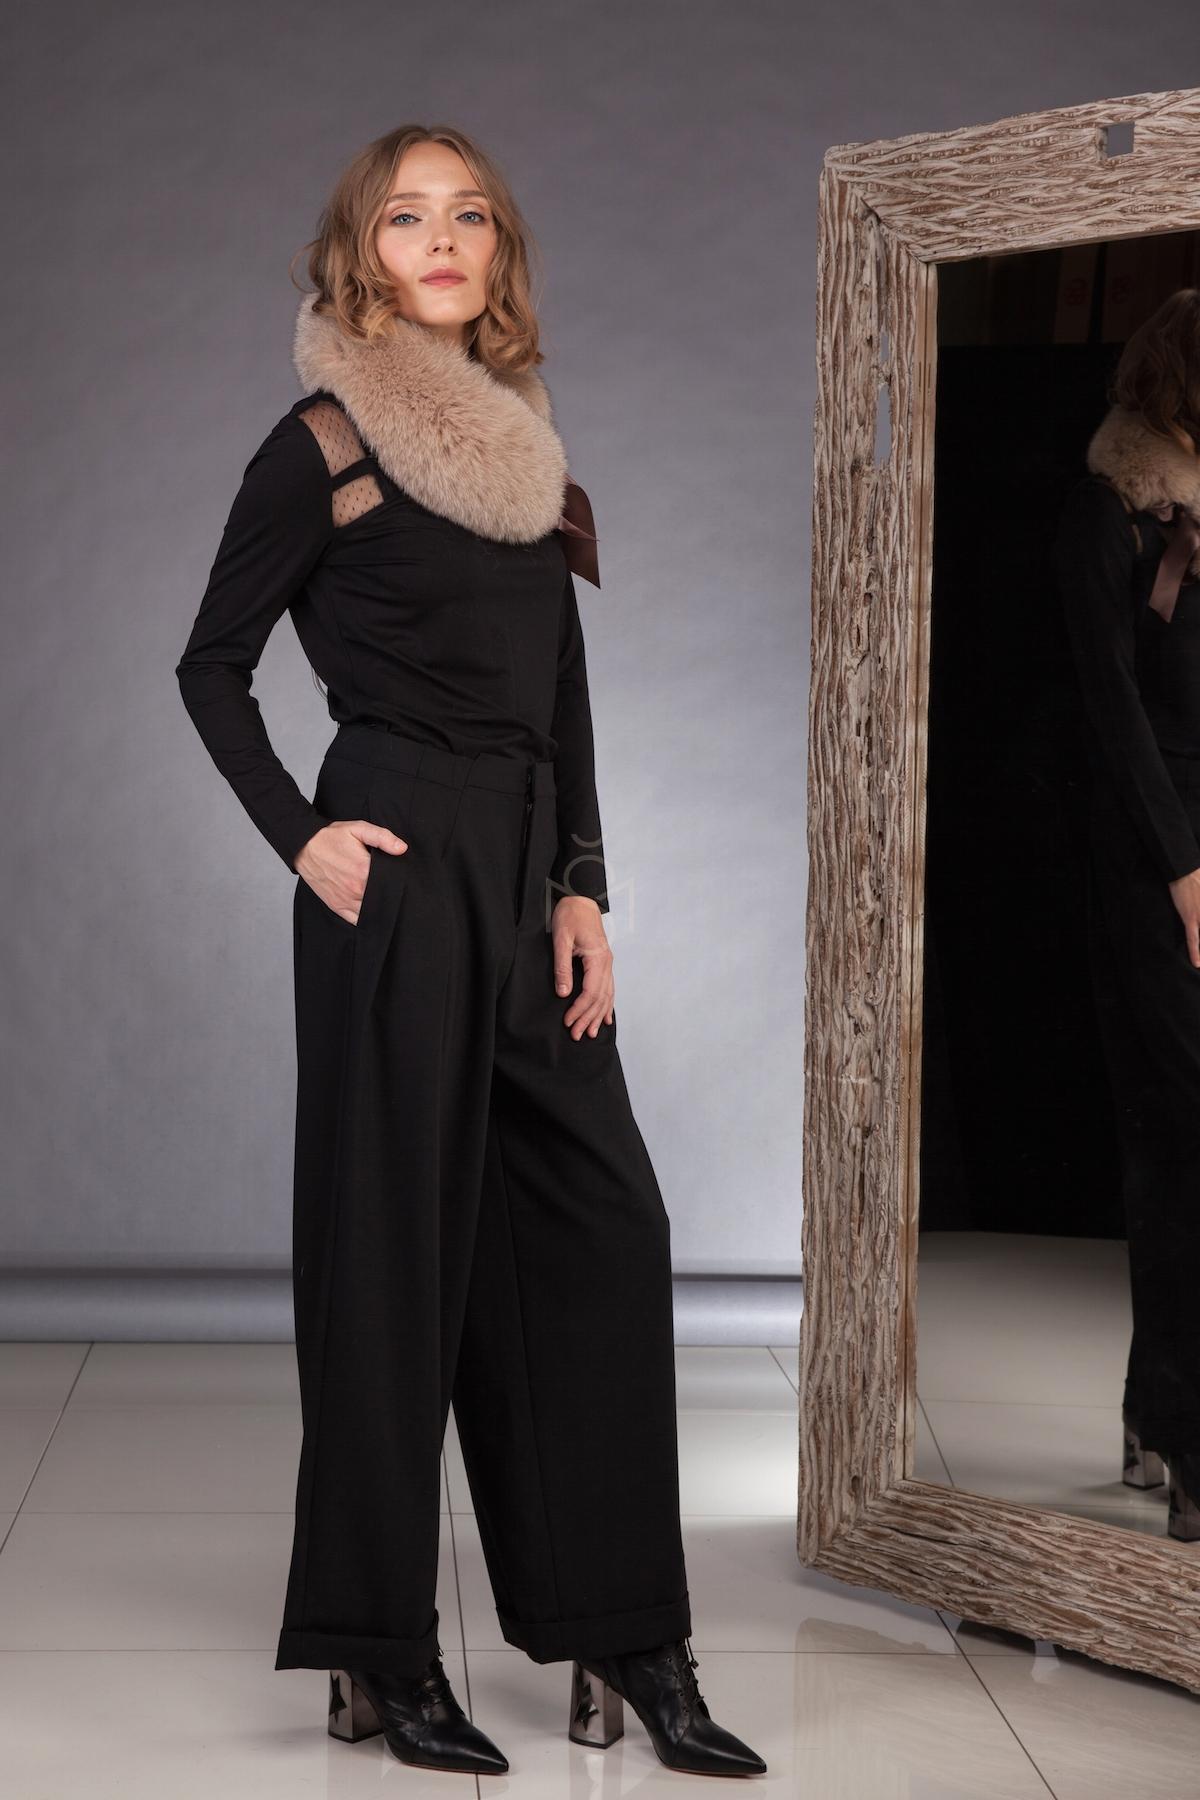 Fox fur scarf, color light brown made by SILTA MADA fur studio in Vilnius